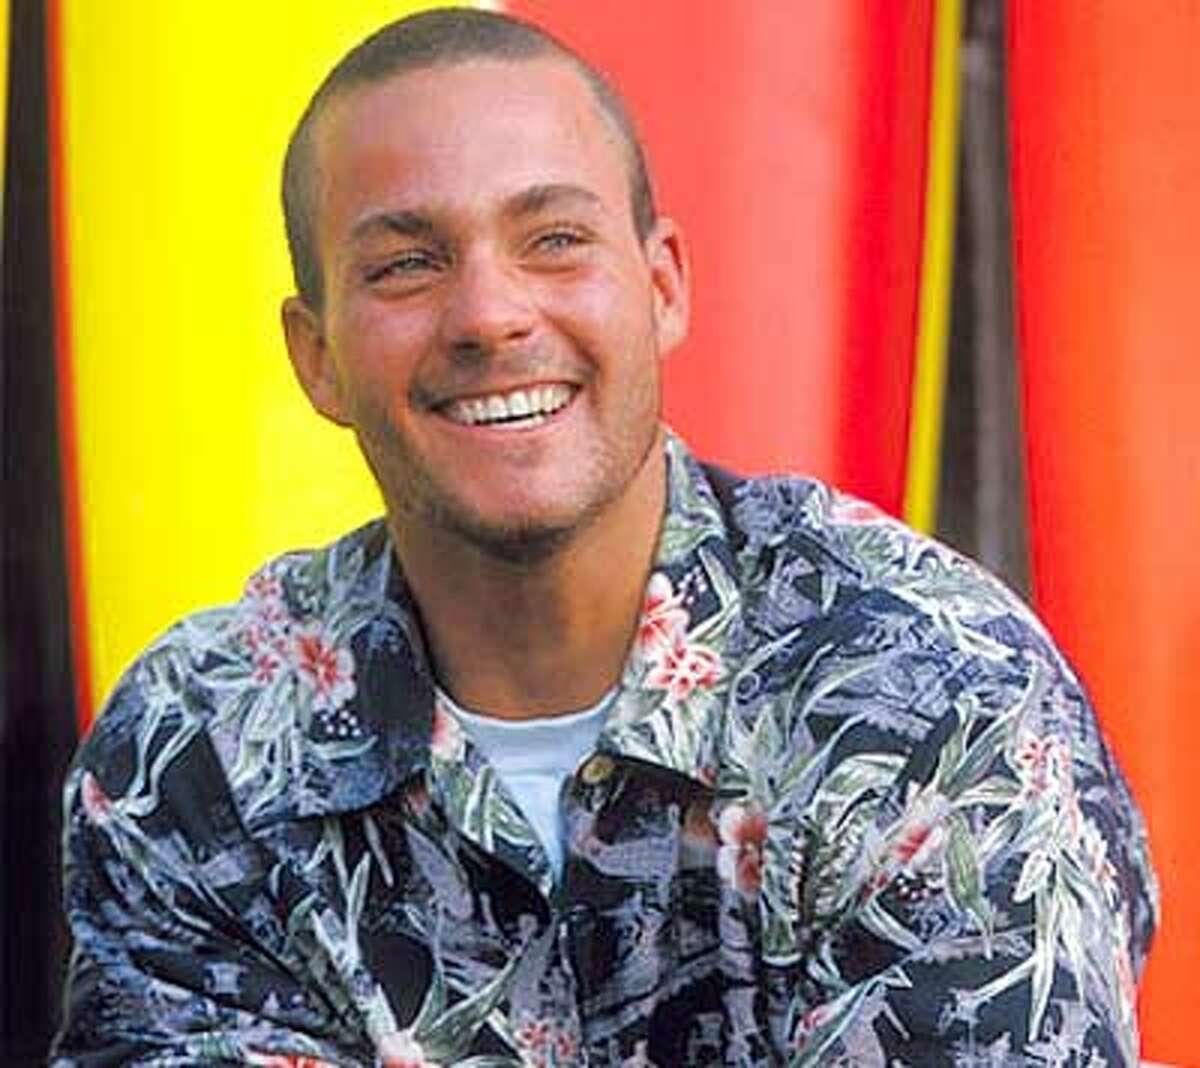 Santa Cruz surfer Jay Moriarity, 22, died off the Indian coast on Friday